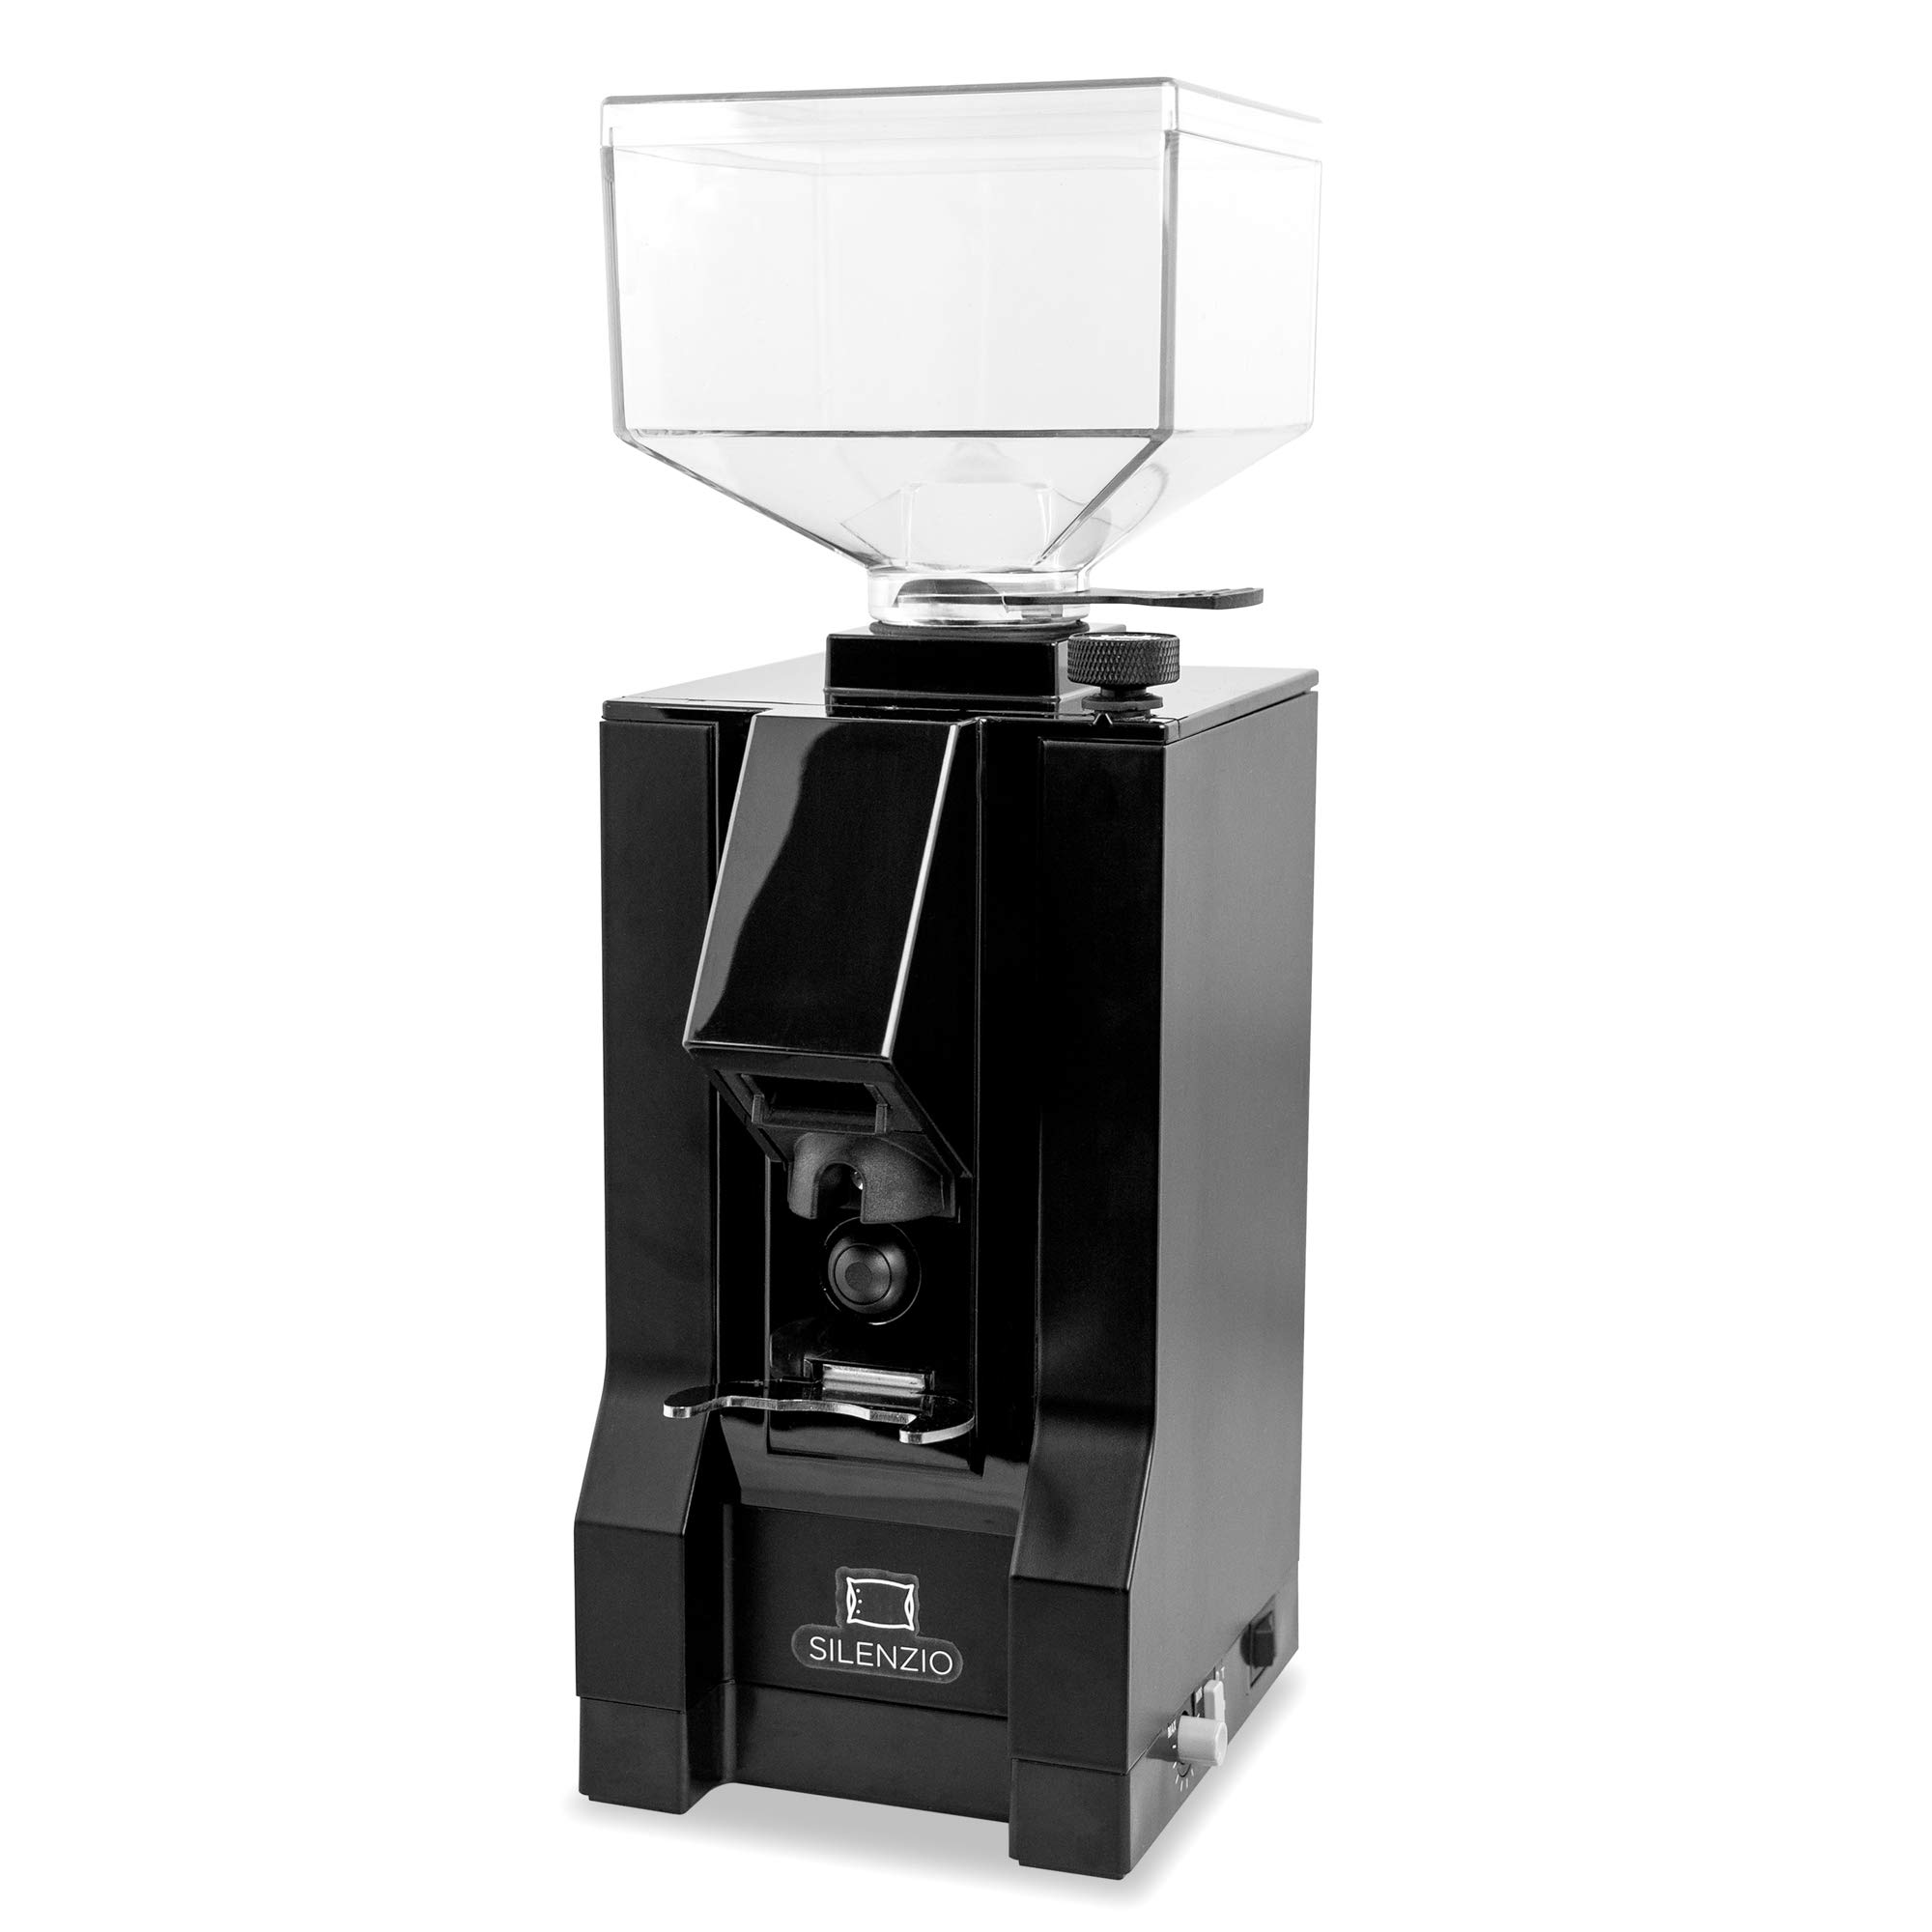 Eureka Mignon Silenzio Ultra Quiet Compact Timed Dosing Espresso Coffee Grinder (Black) by Eureka